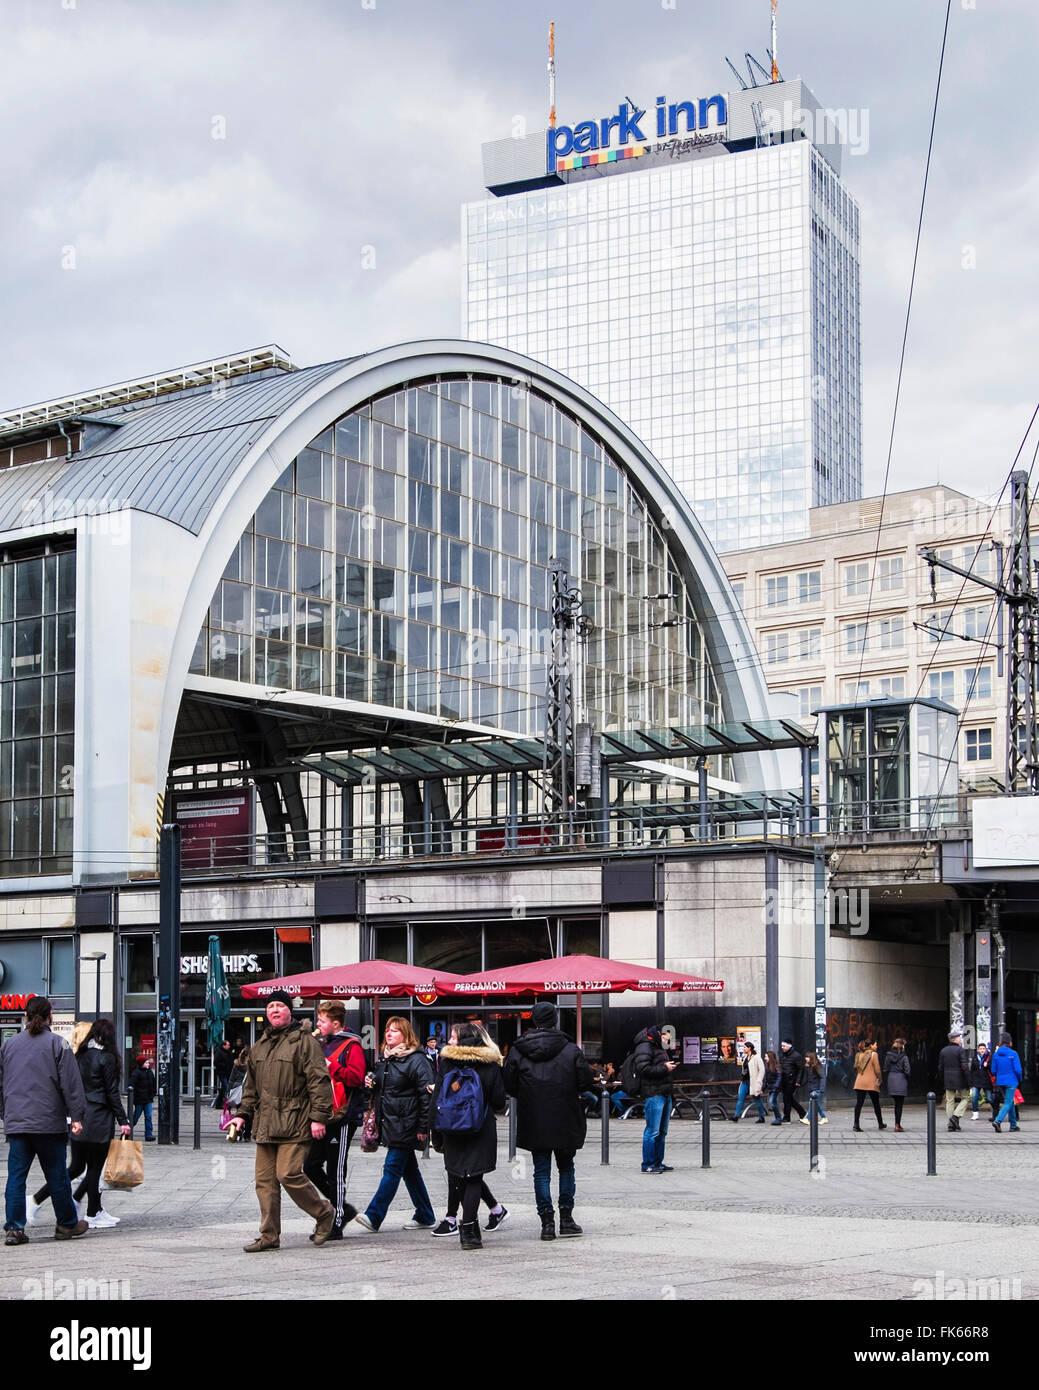 Berlin Alexanderplatz S-bahn railway station exterior and Park Inn - Stock Image